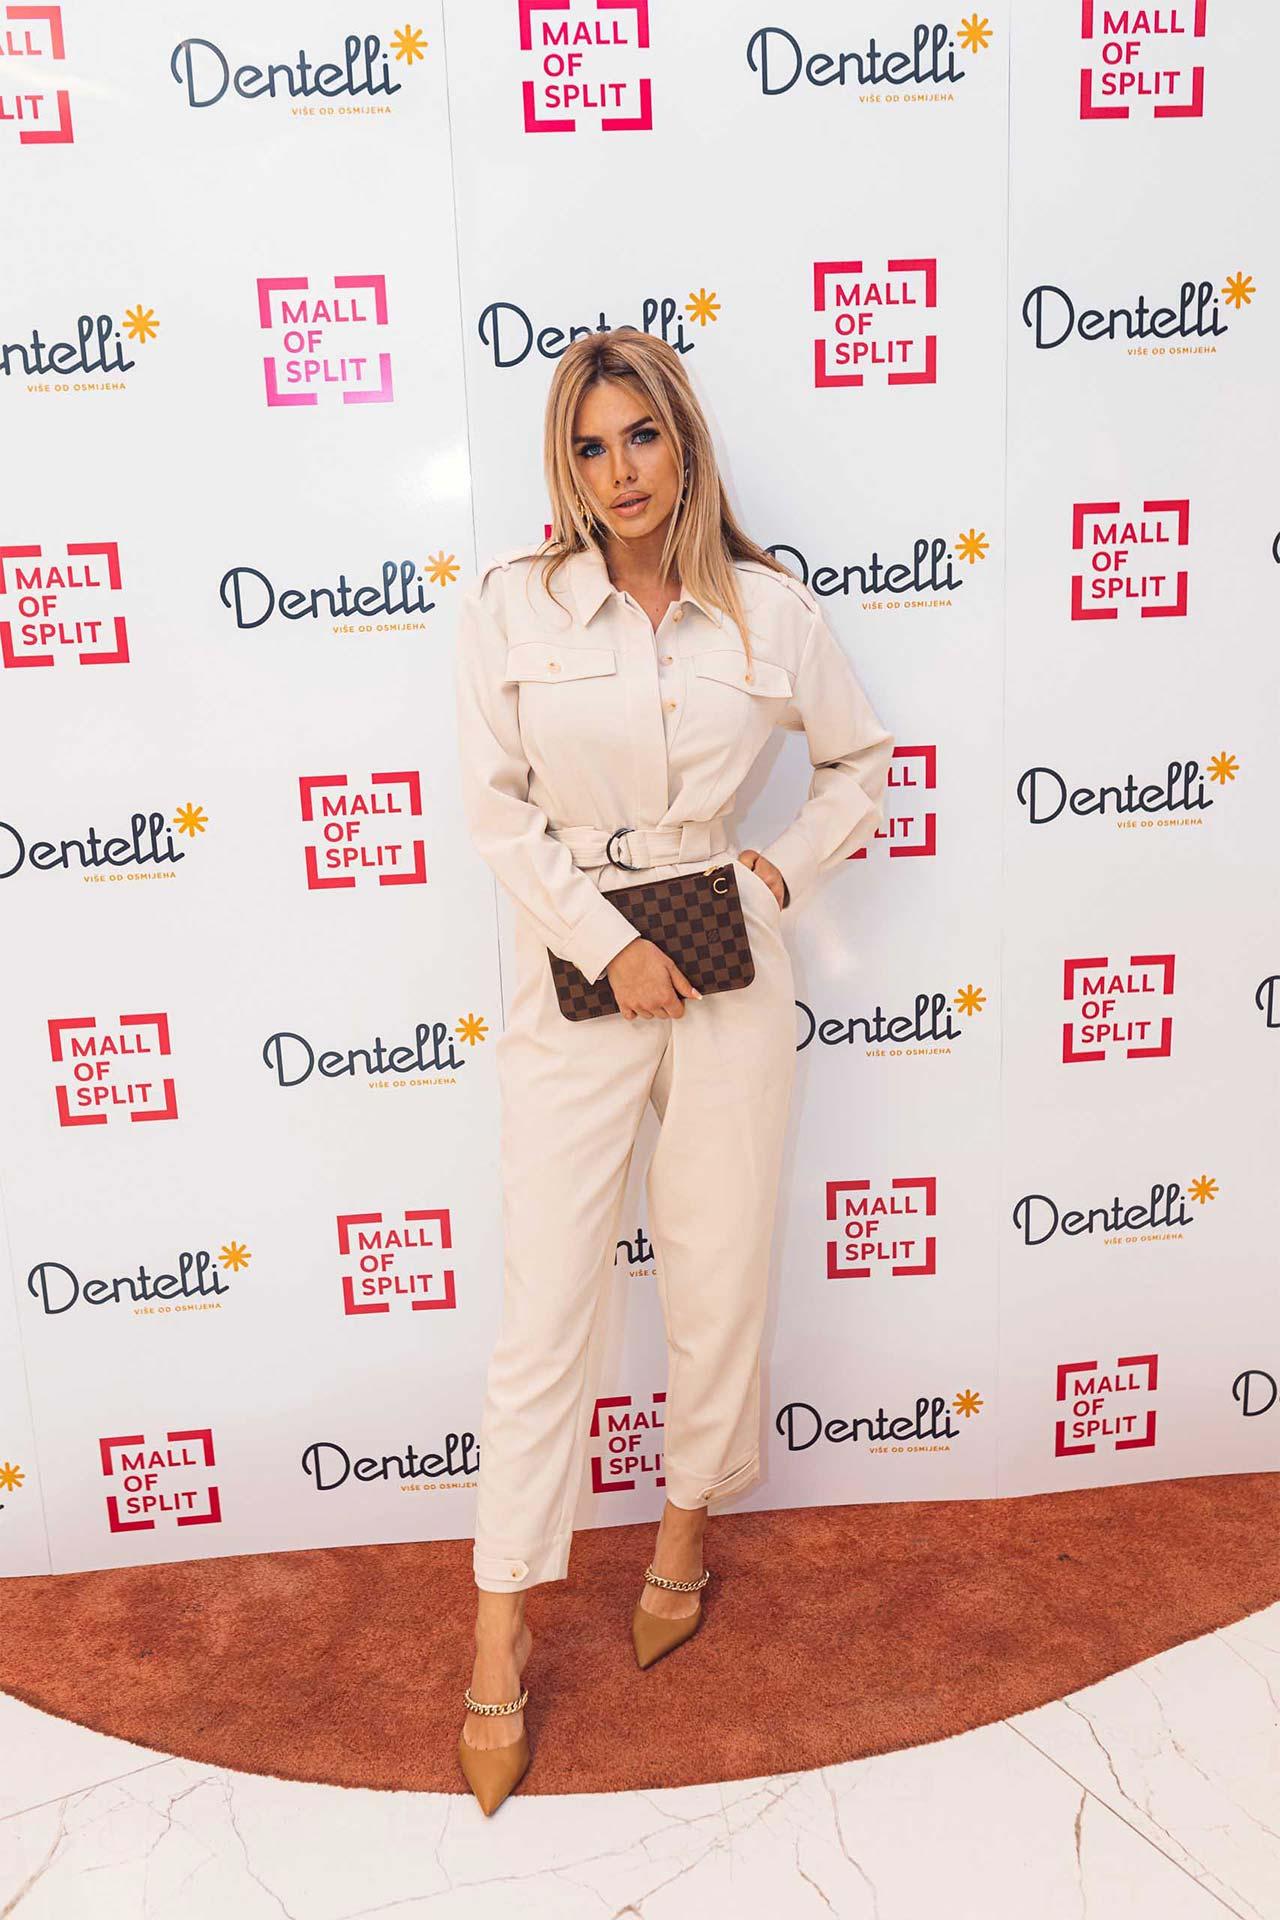 Dentelli Fashion Show - Wall of Fame (5)